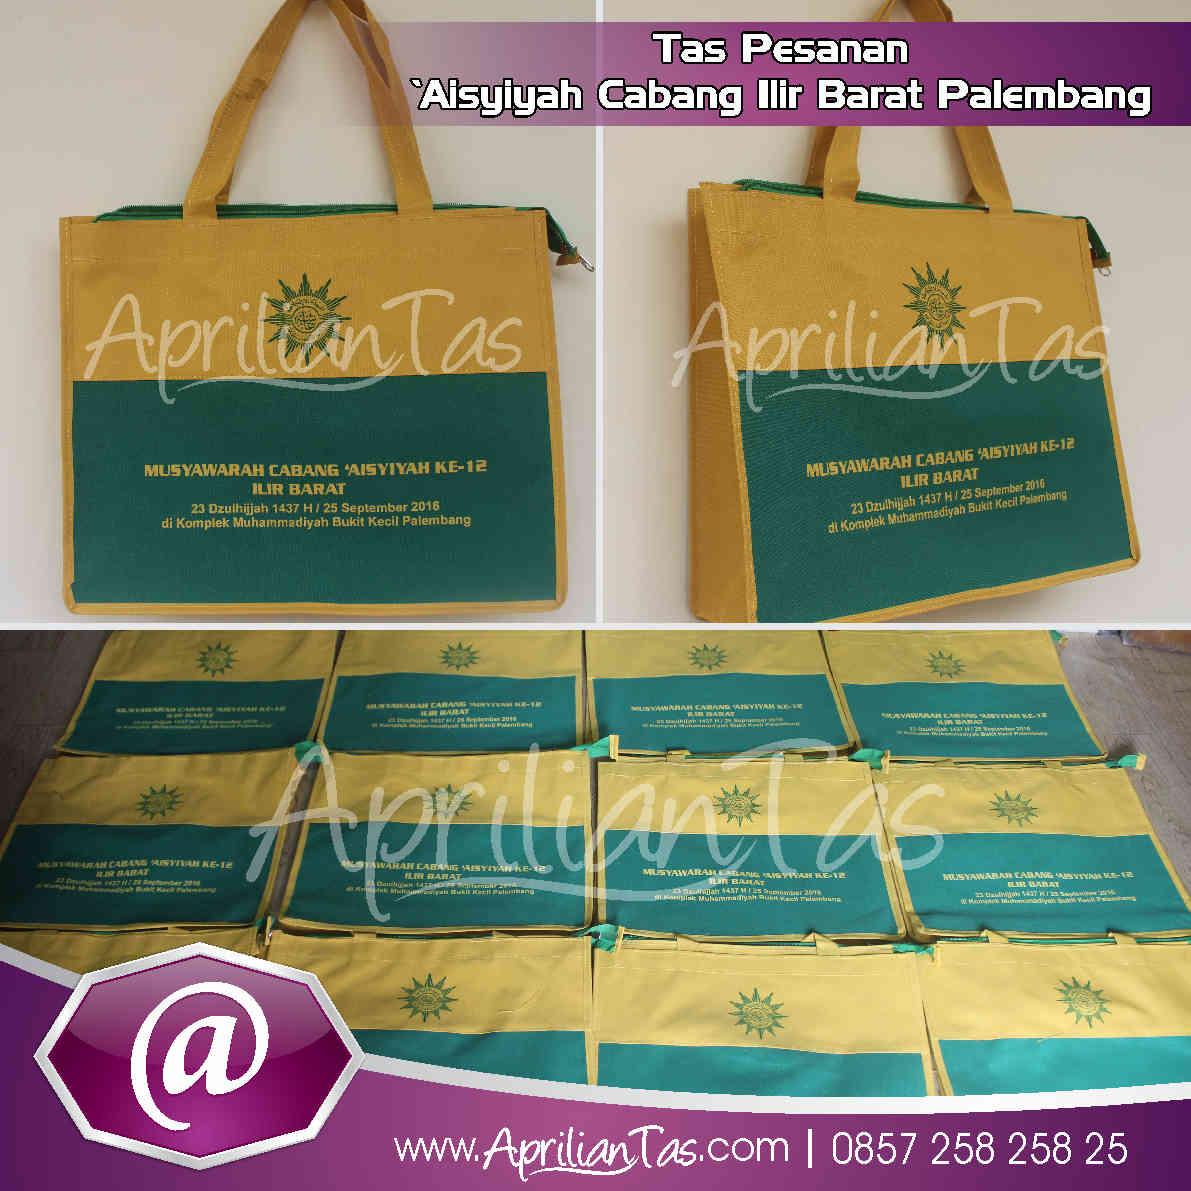 Tas Seminar Pesanan 'Aisyiyah Ilir Barat Palembang